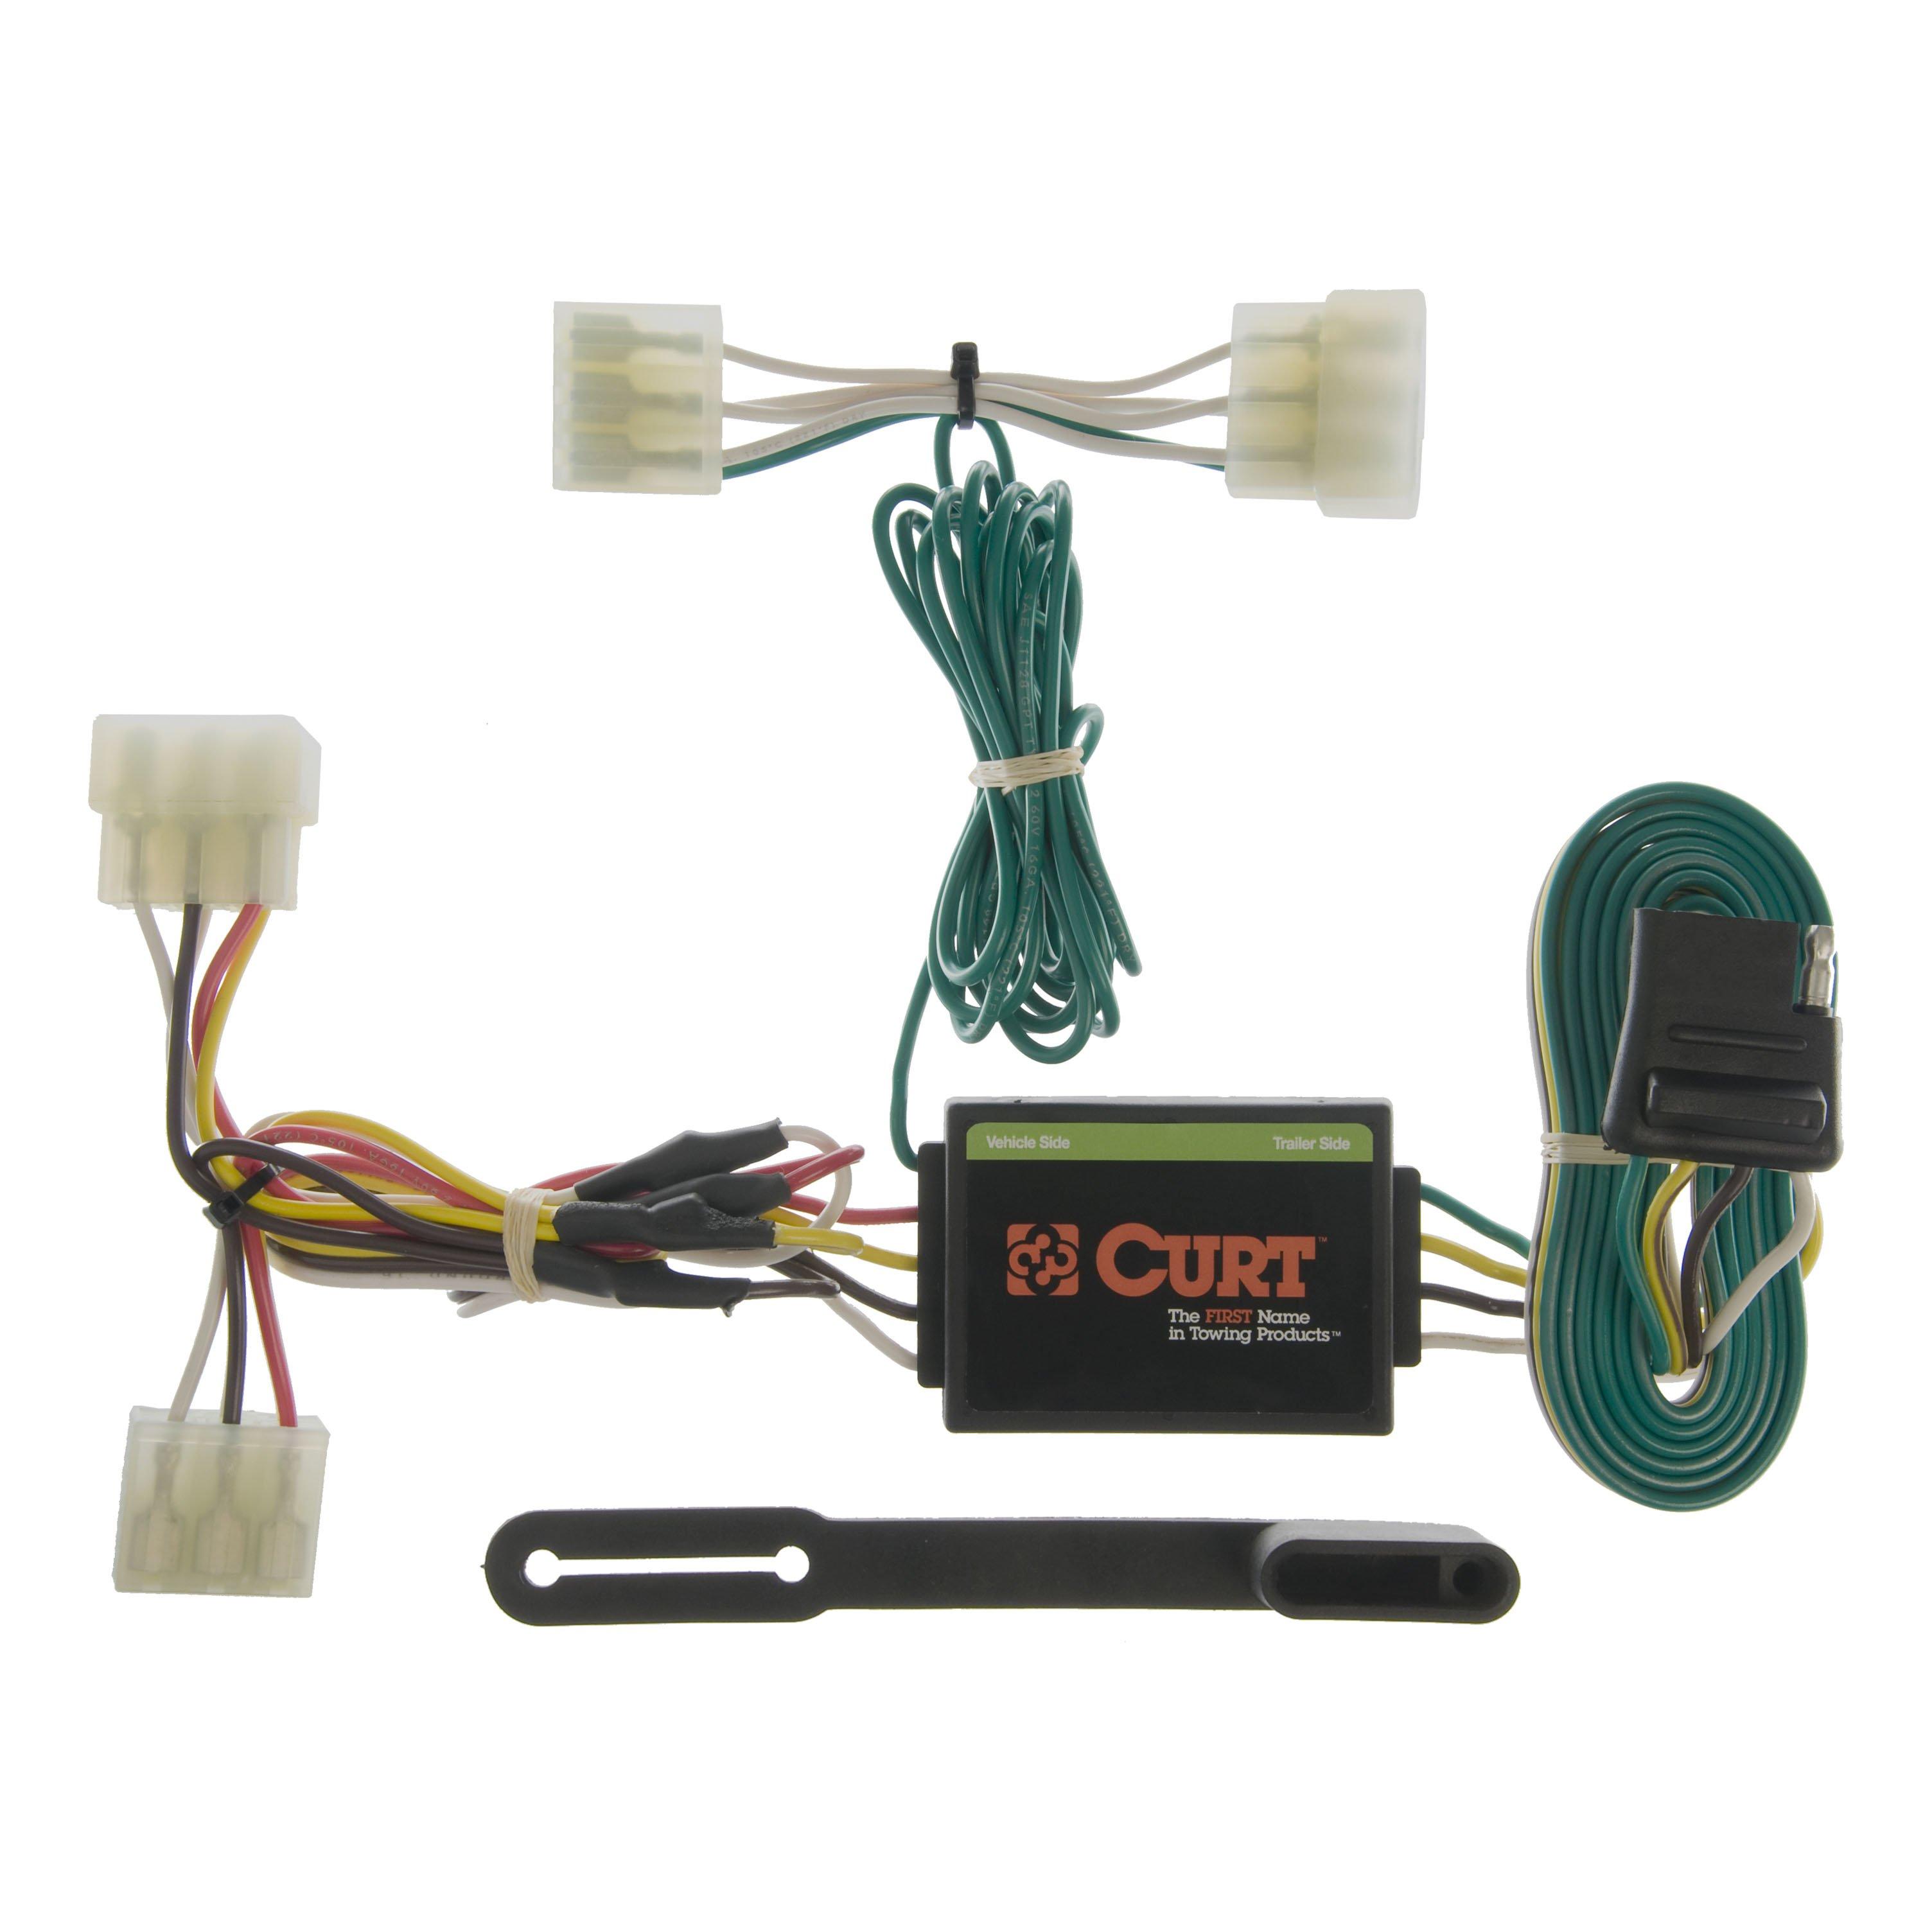 curt vehicle-to-trailer wiring harness 55304 for mazda b2000, b2200, b2600